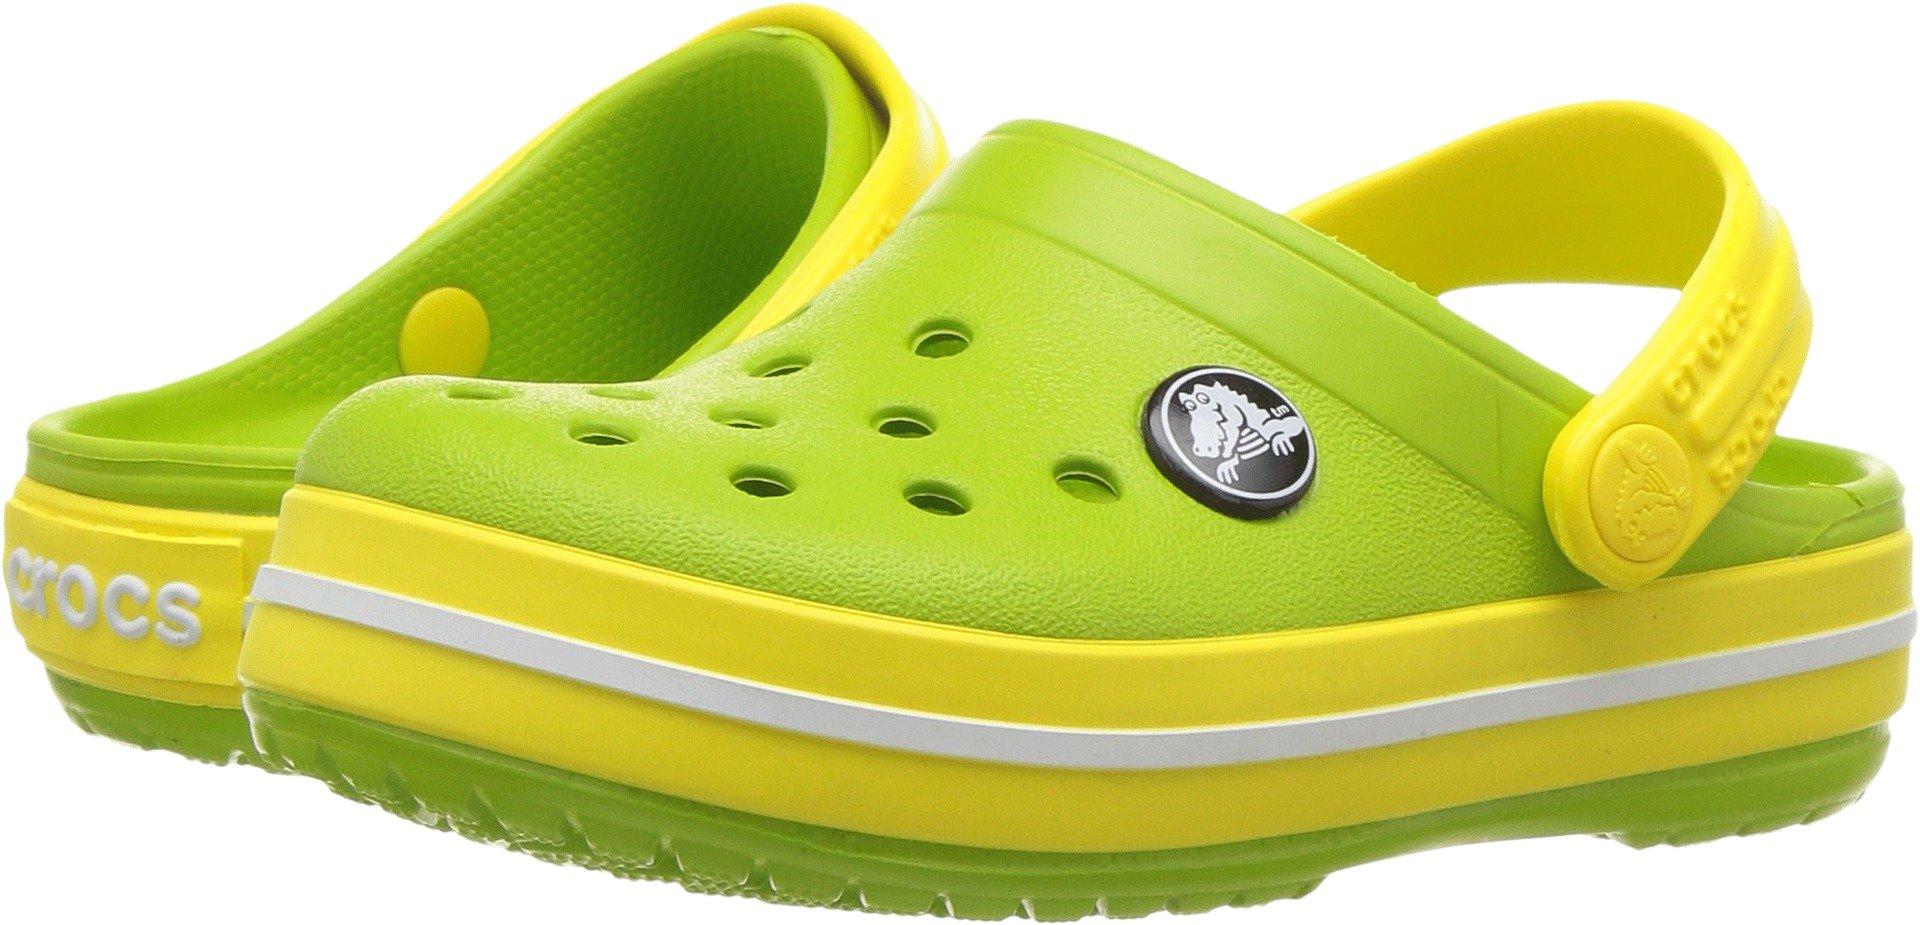 Crocs Kids' Crocband Clog